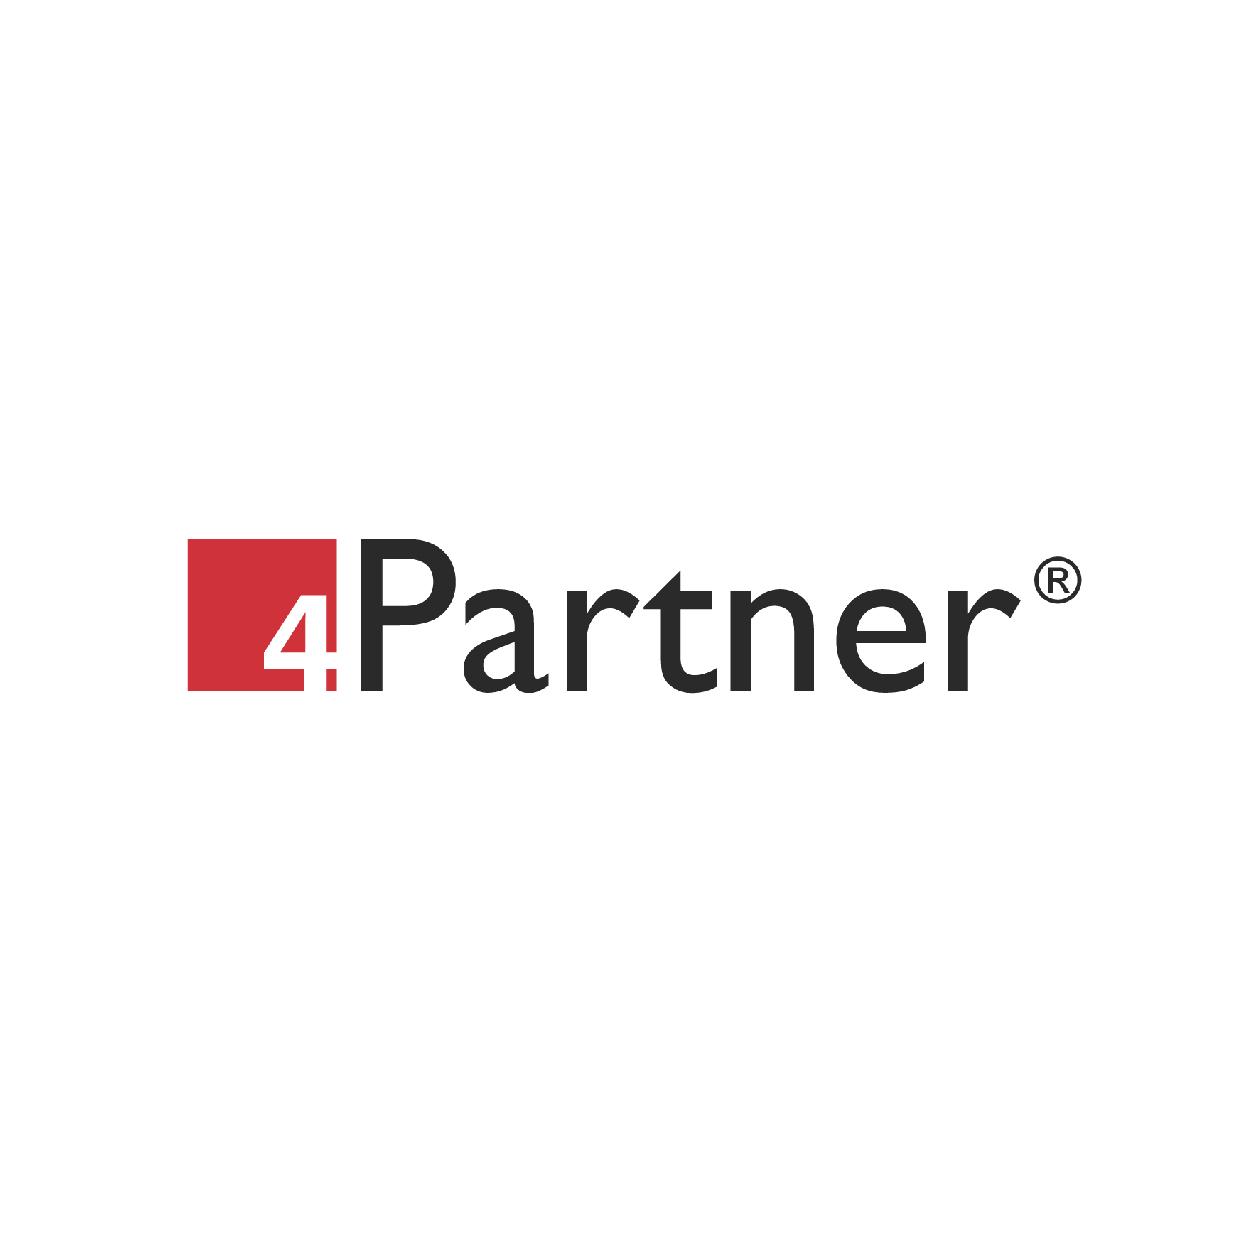 Logo de 4Partner